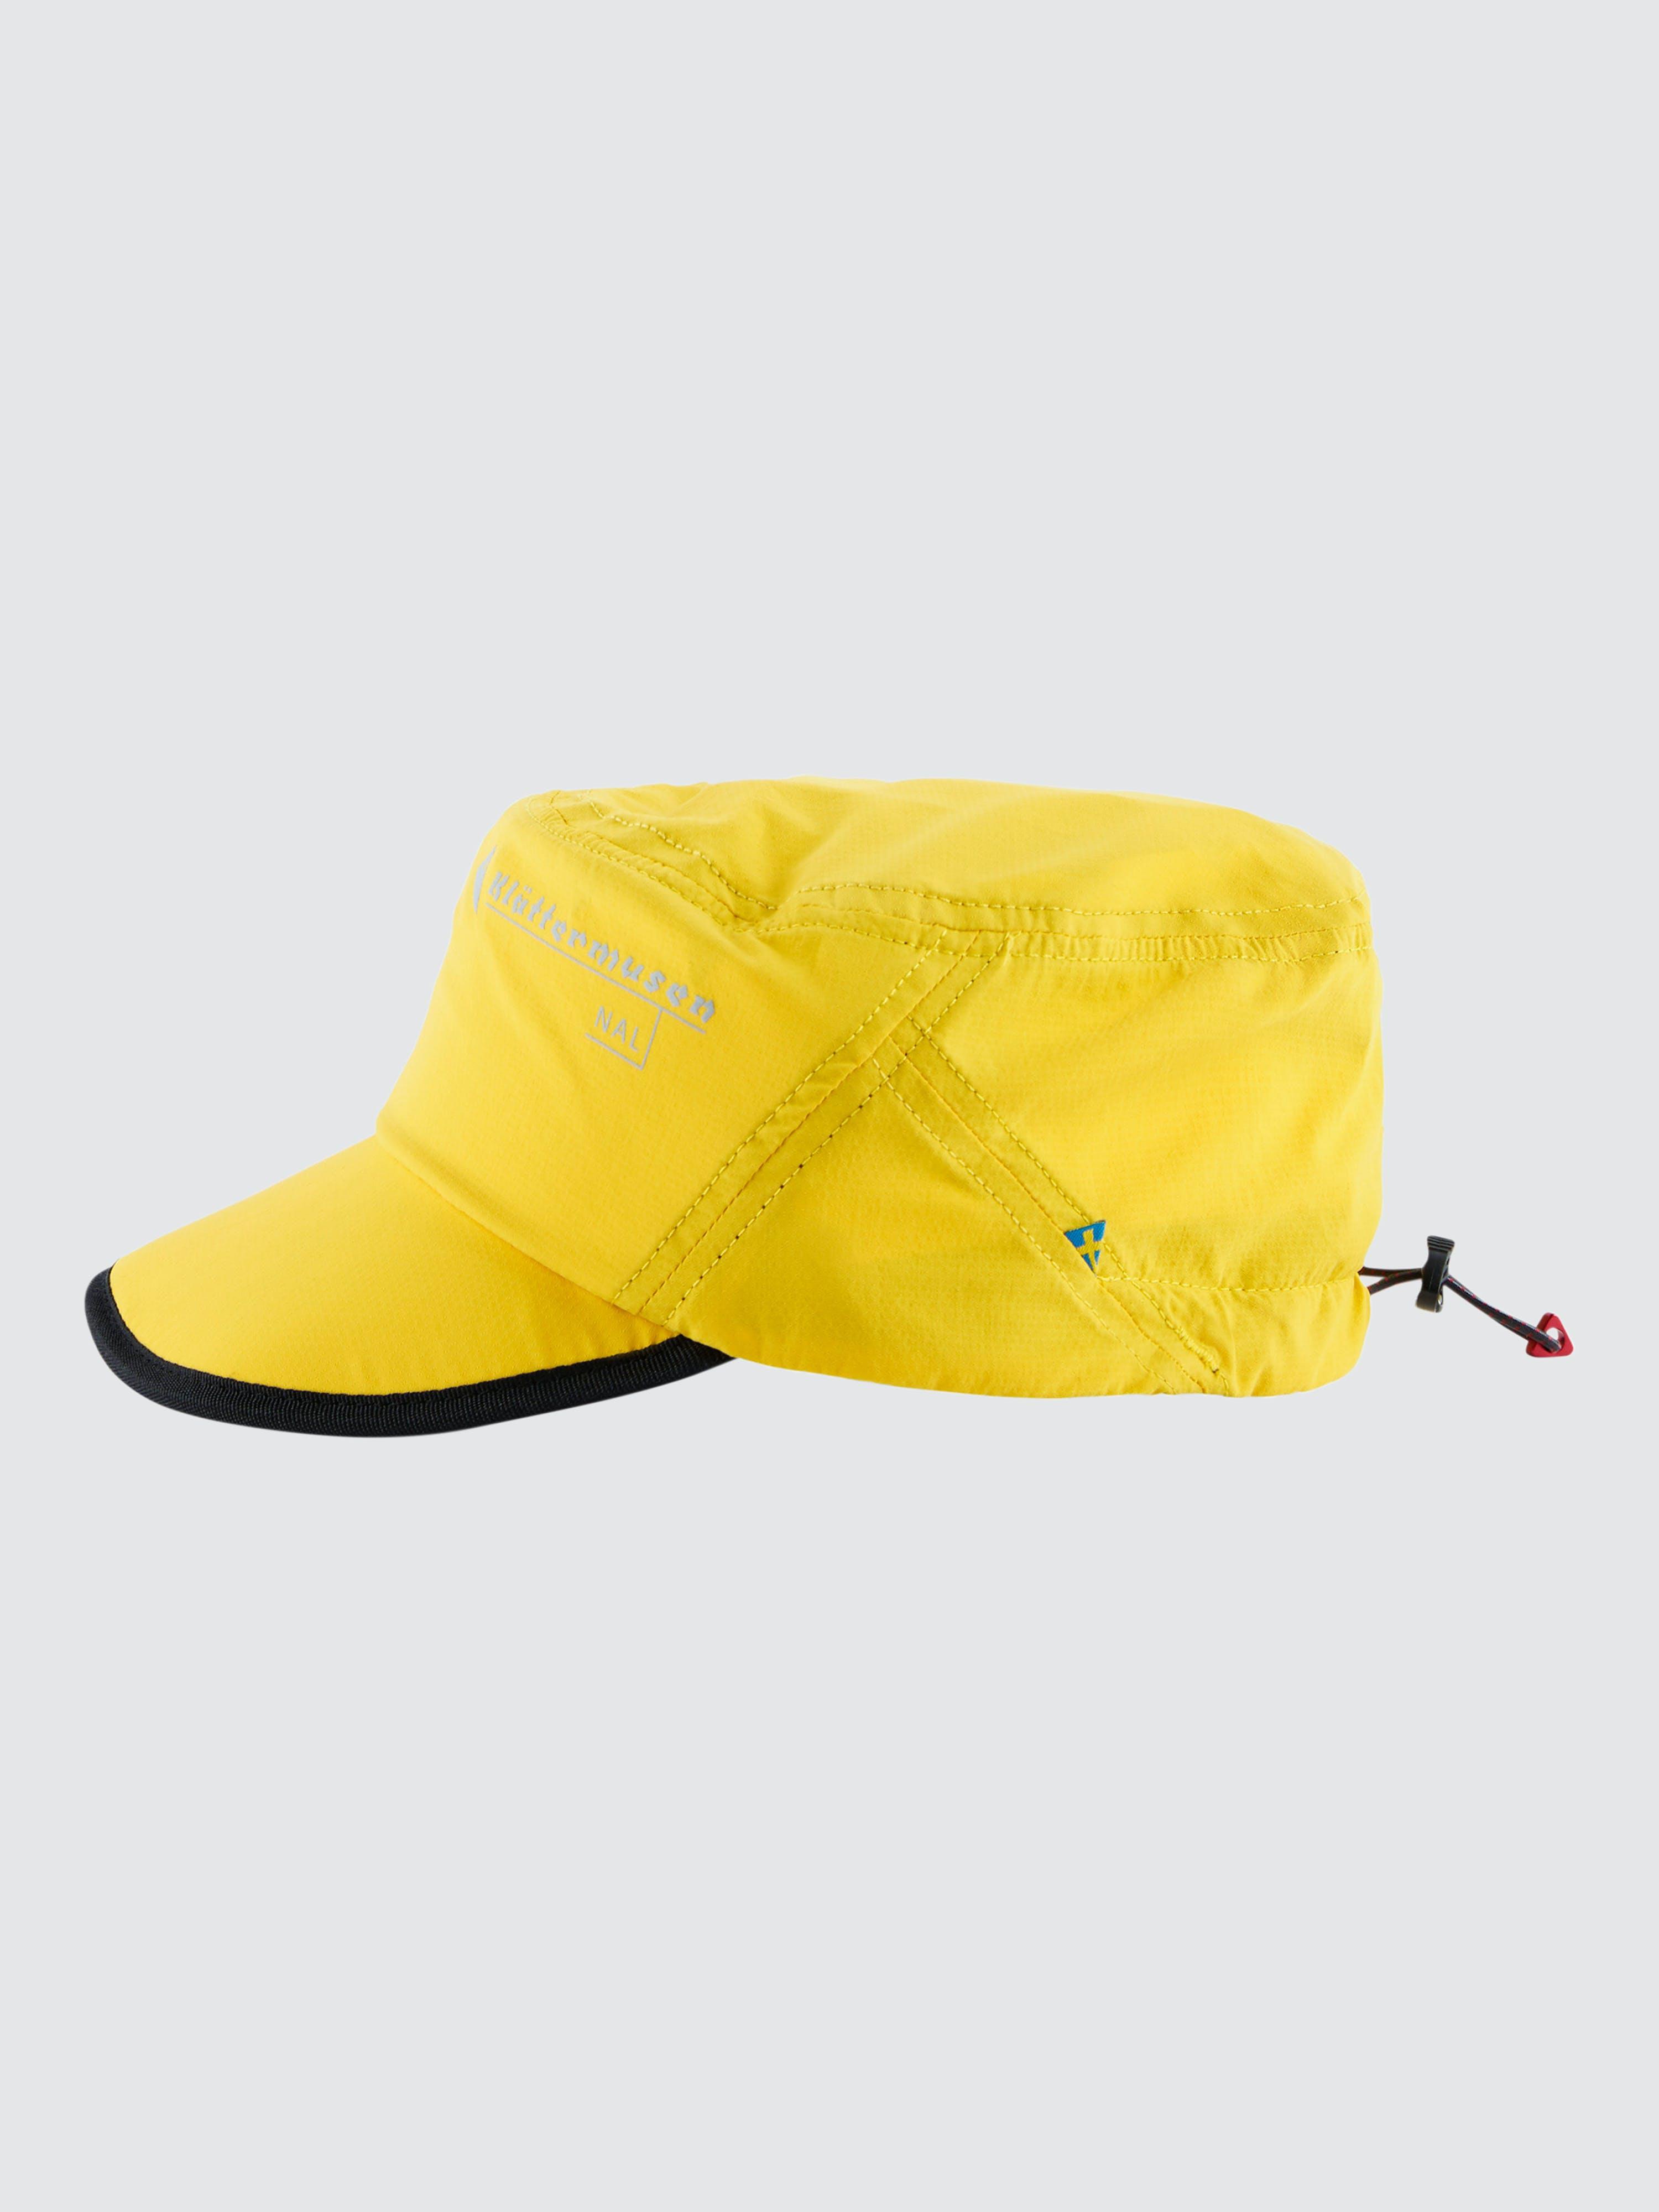 Klattermusen Nal Cap - ONE/SIZE  - Yellow